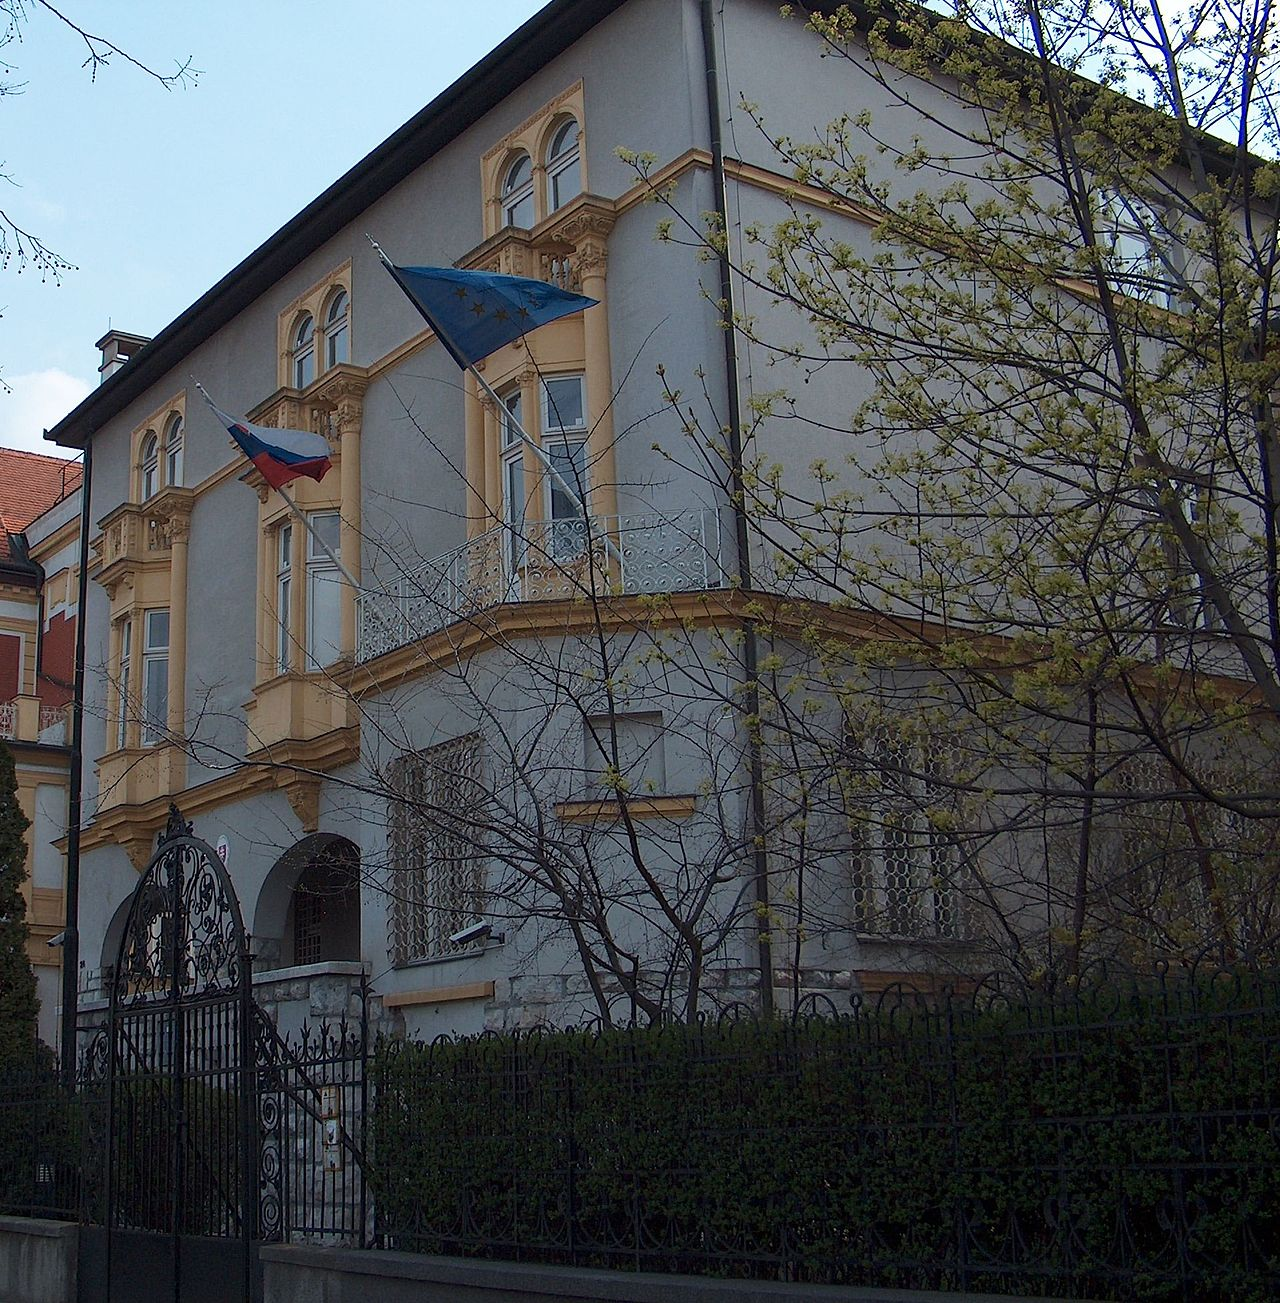 velvyslanectvo, diplomati, slovenský dom